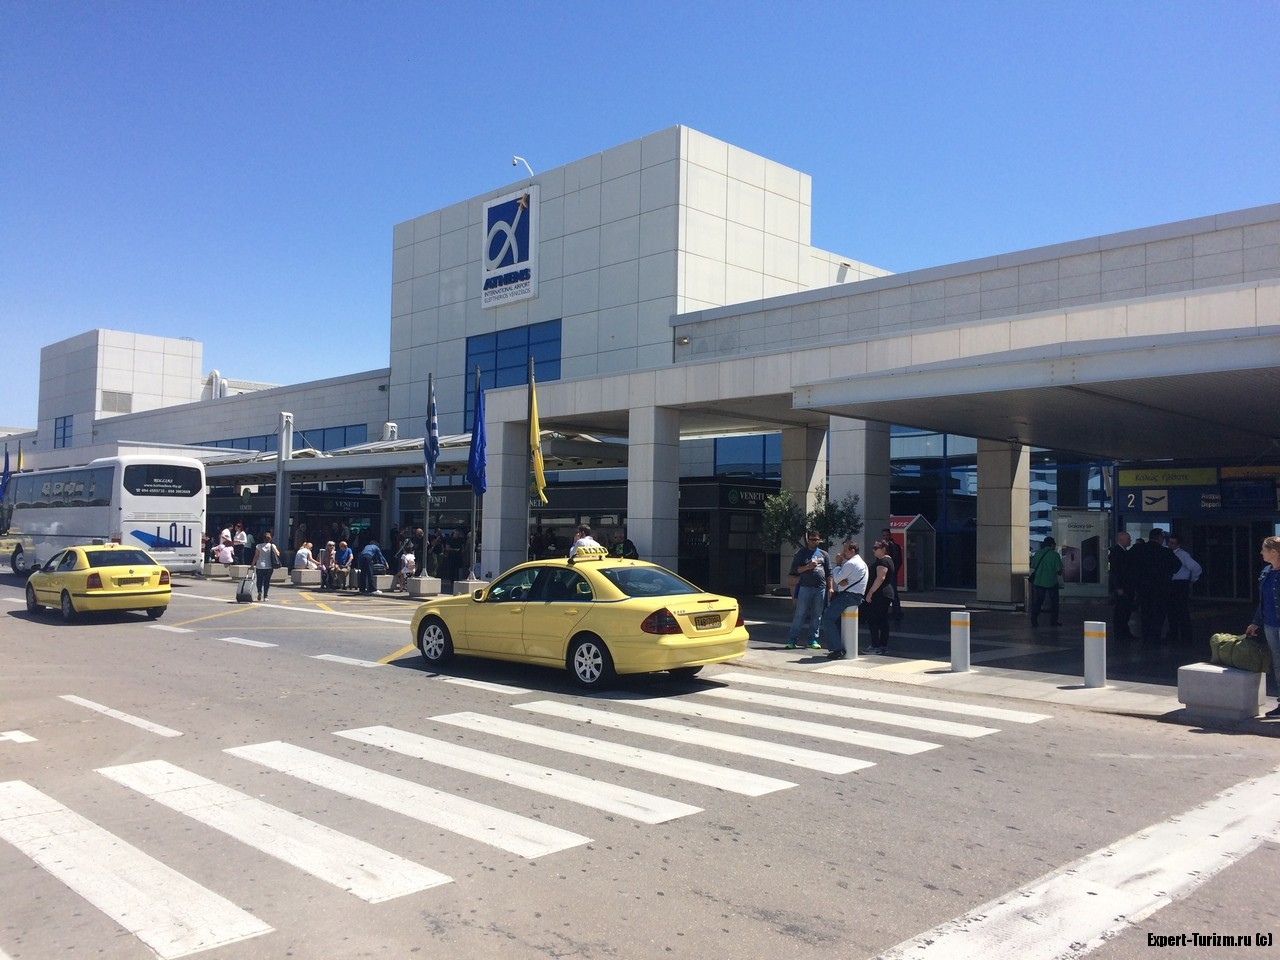 Аэропорт Афин зона вылета